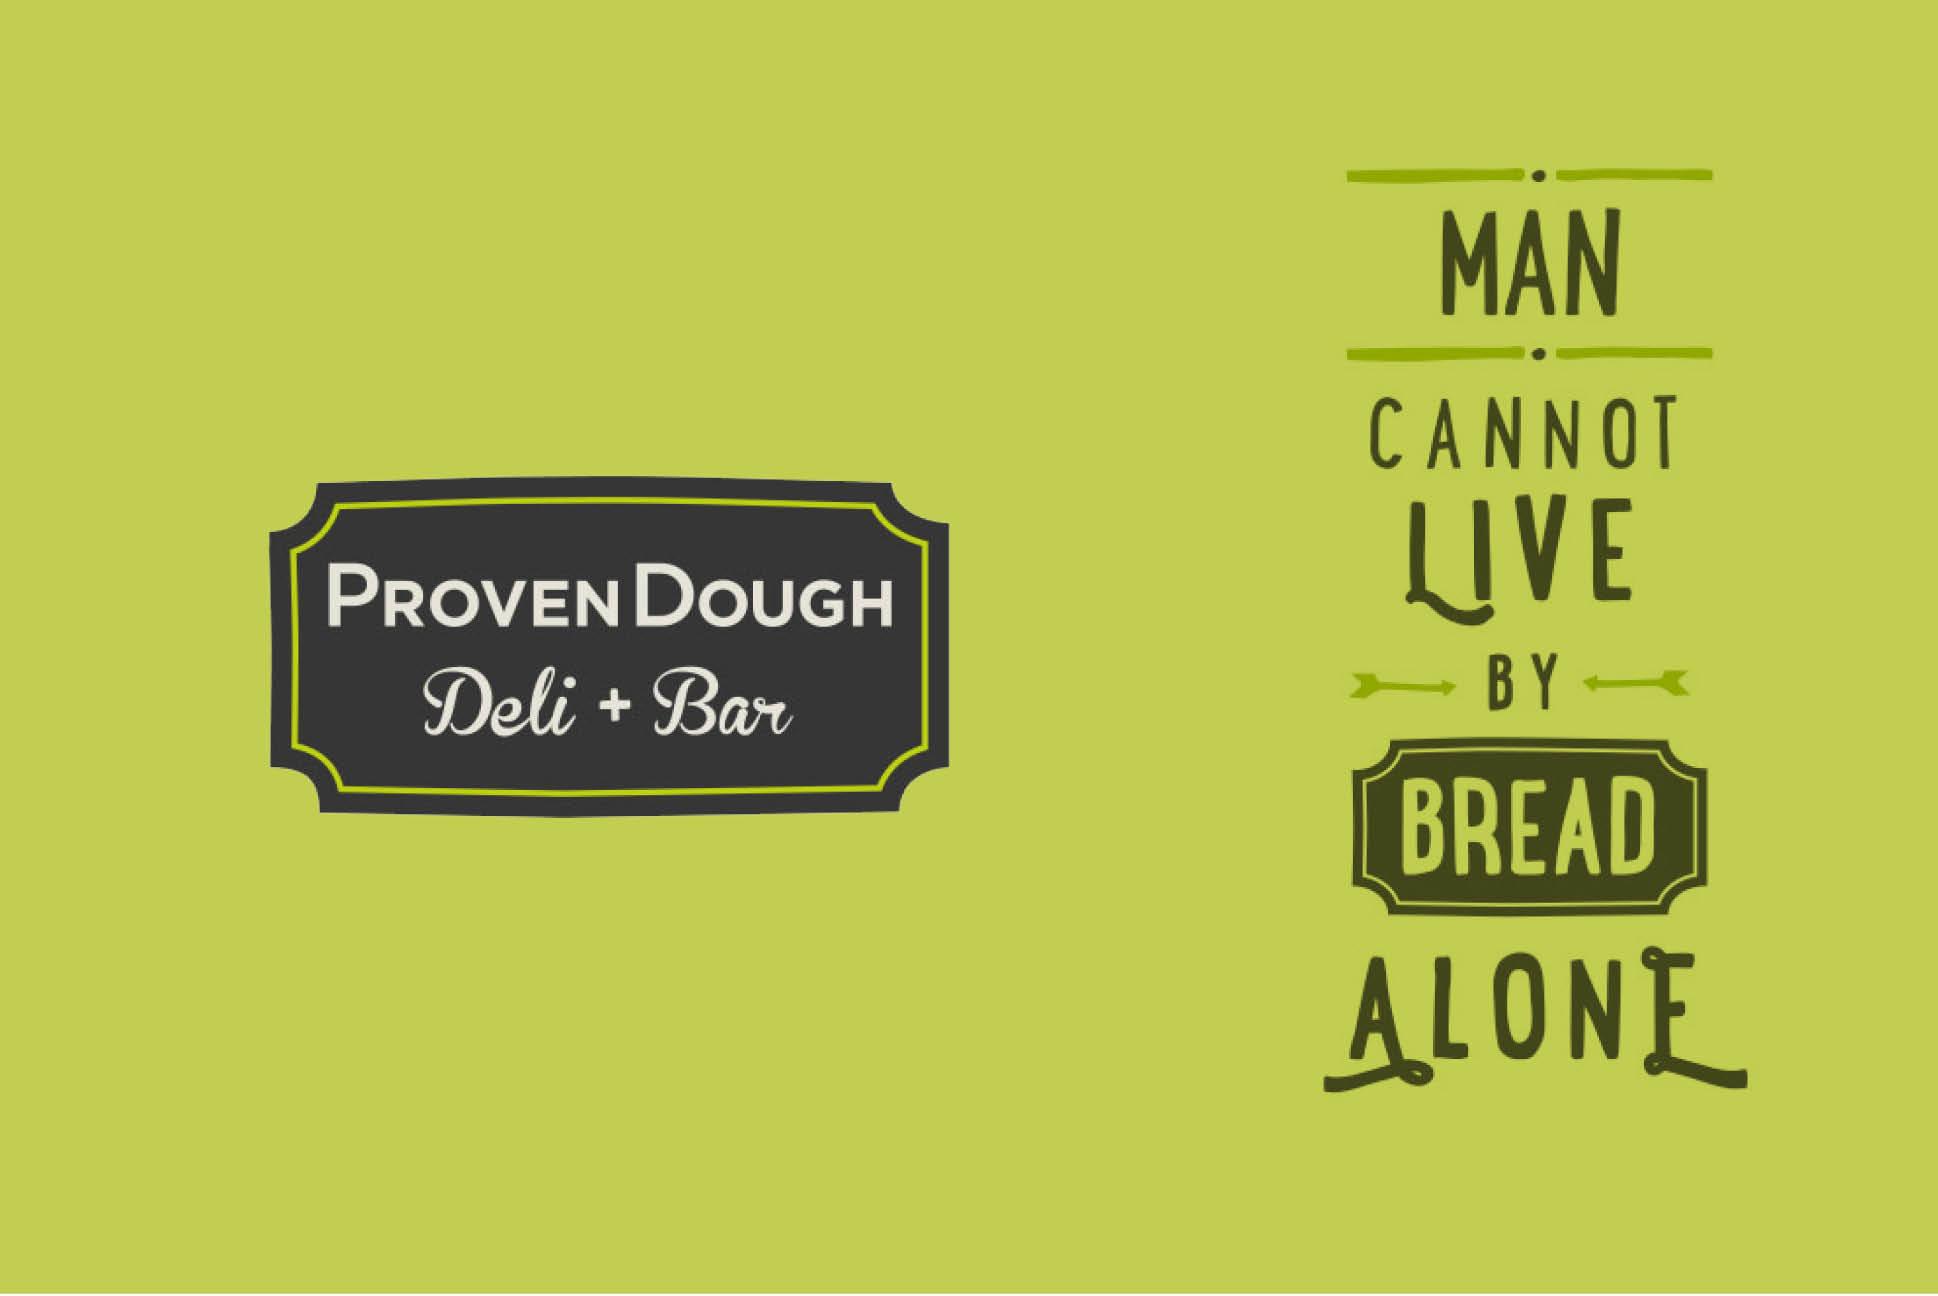 ProvenDough branding   Branding and Identity Design - Independent Marketing   IM London